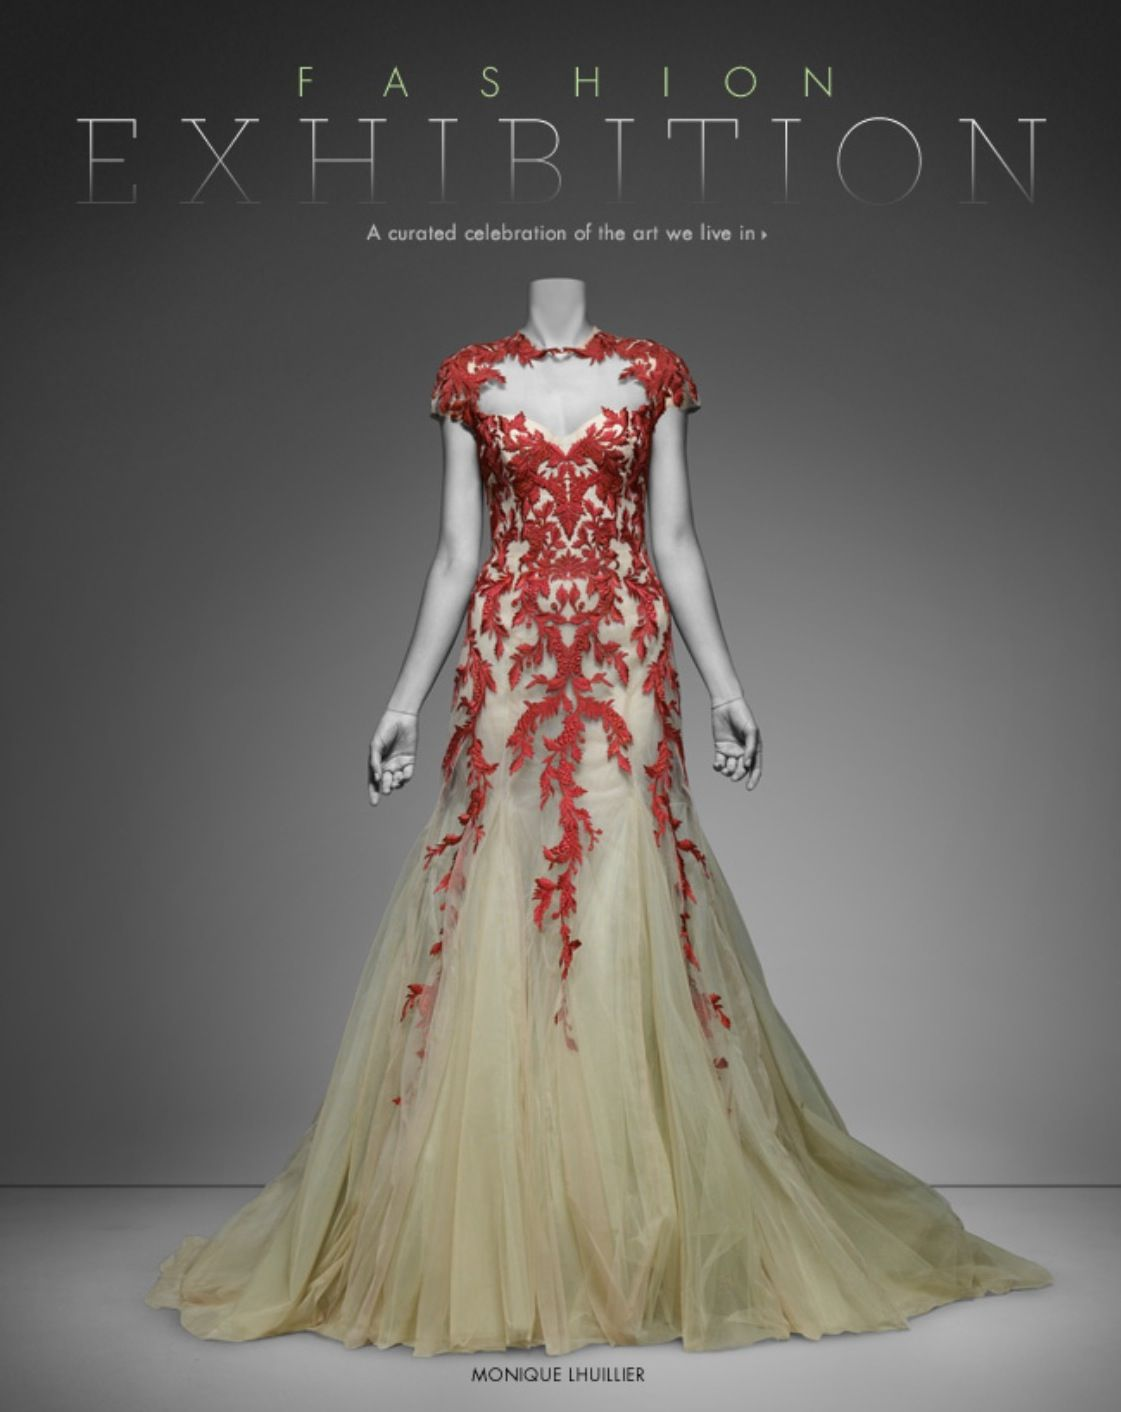 2012 Neiman Marcus ad campaign featuring Monique Lhuillier | Dresses ...